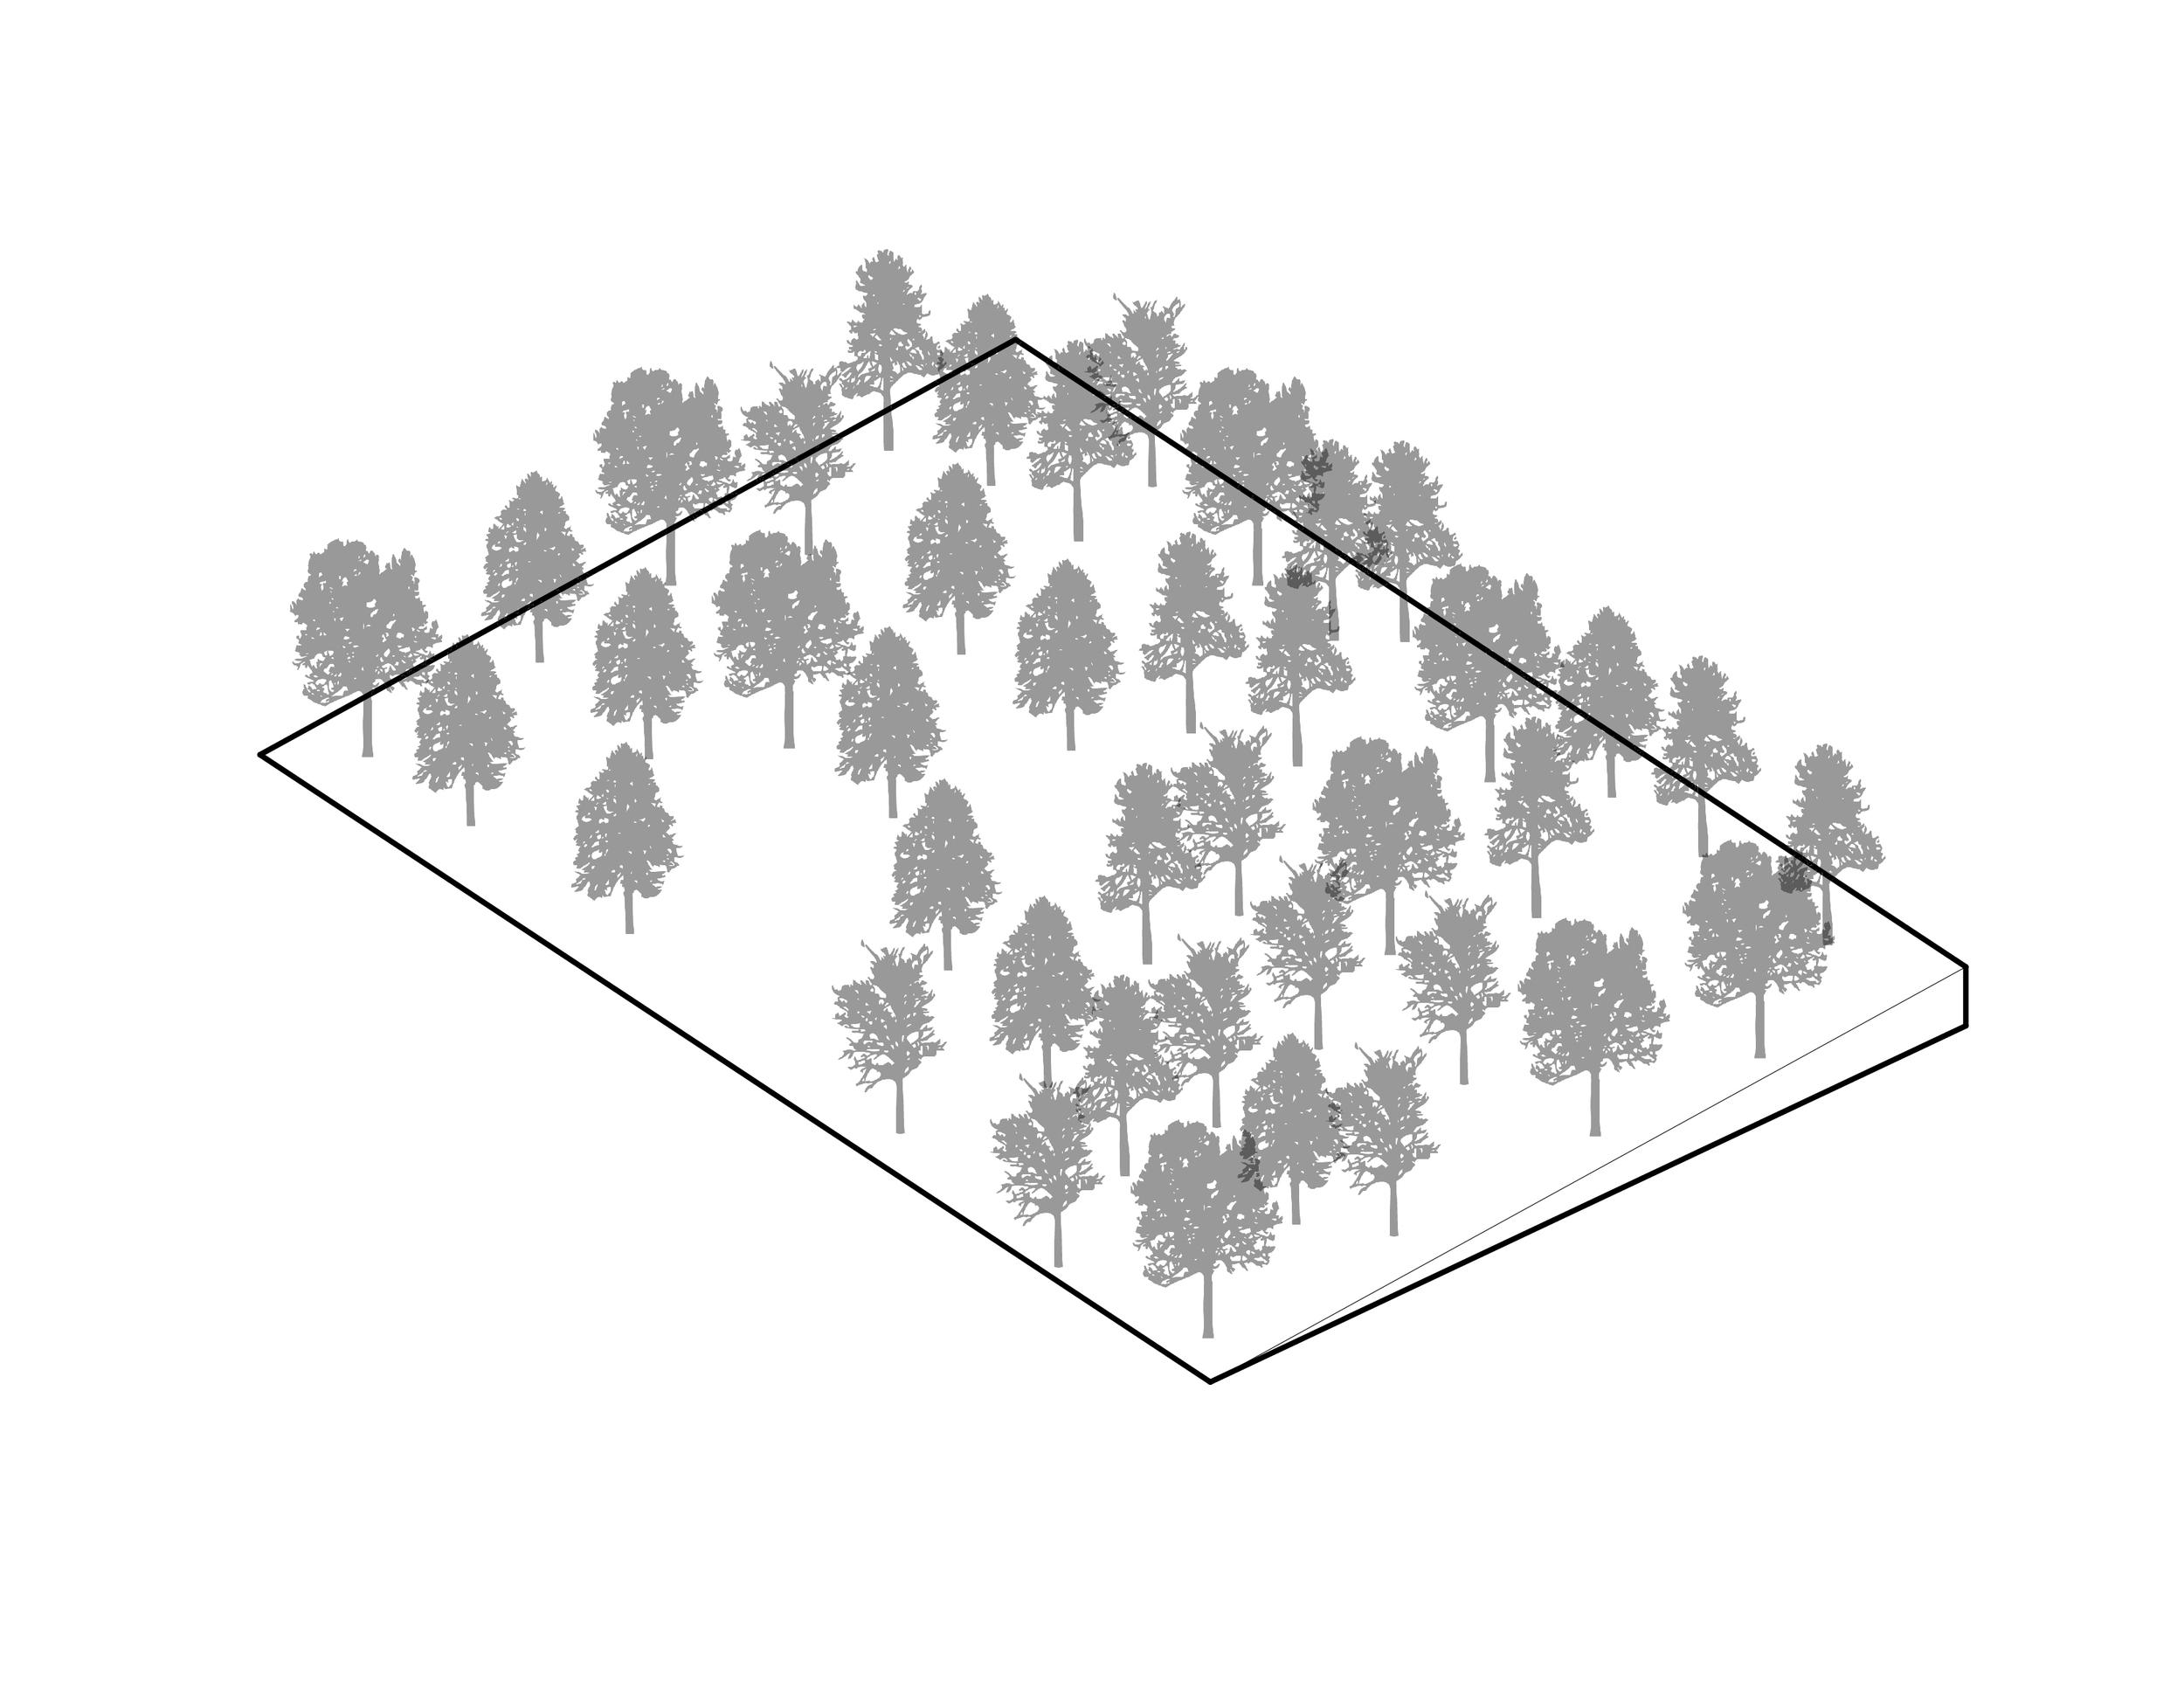 1407_01_Diagrams_Site-01.jpg